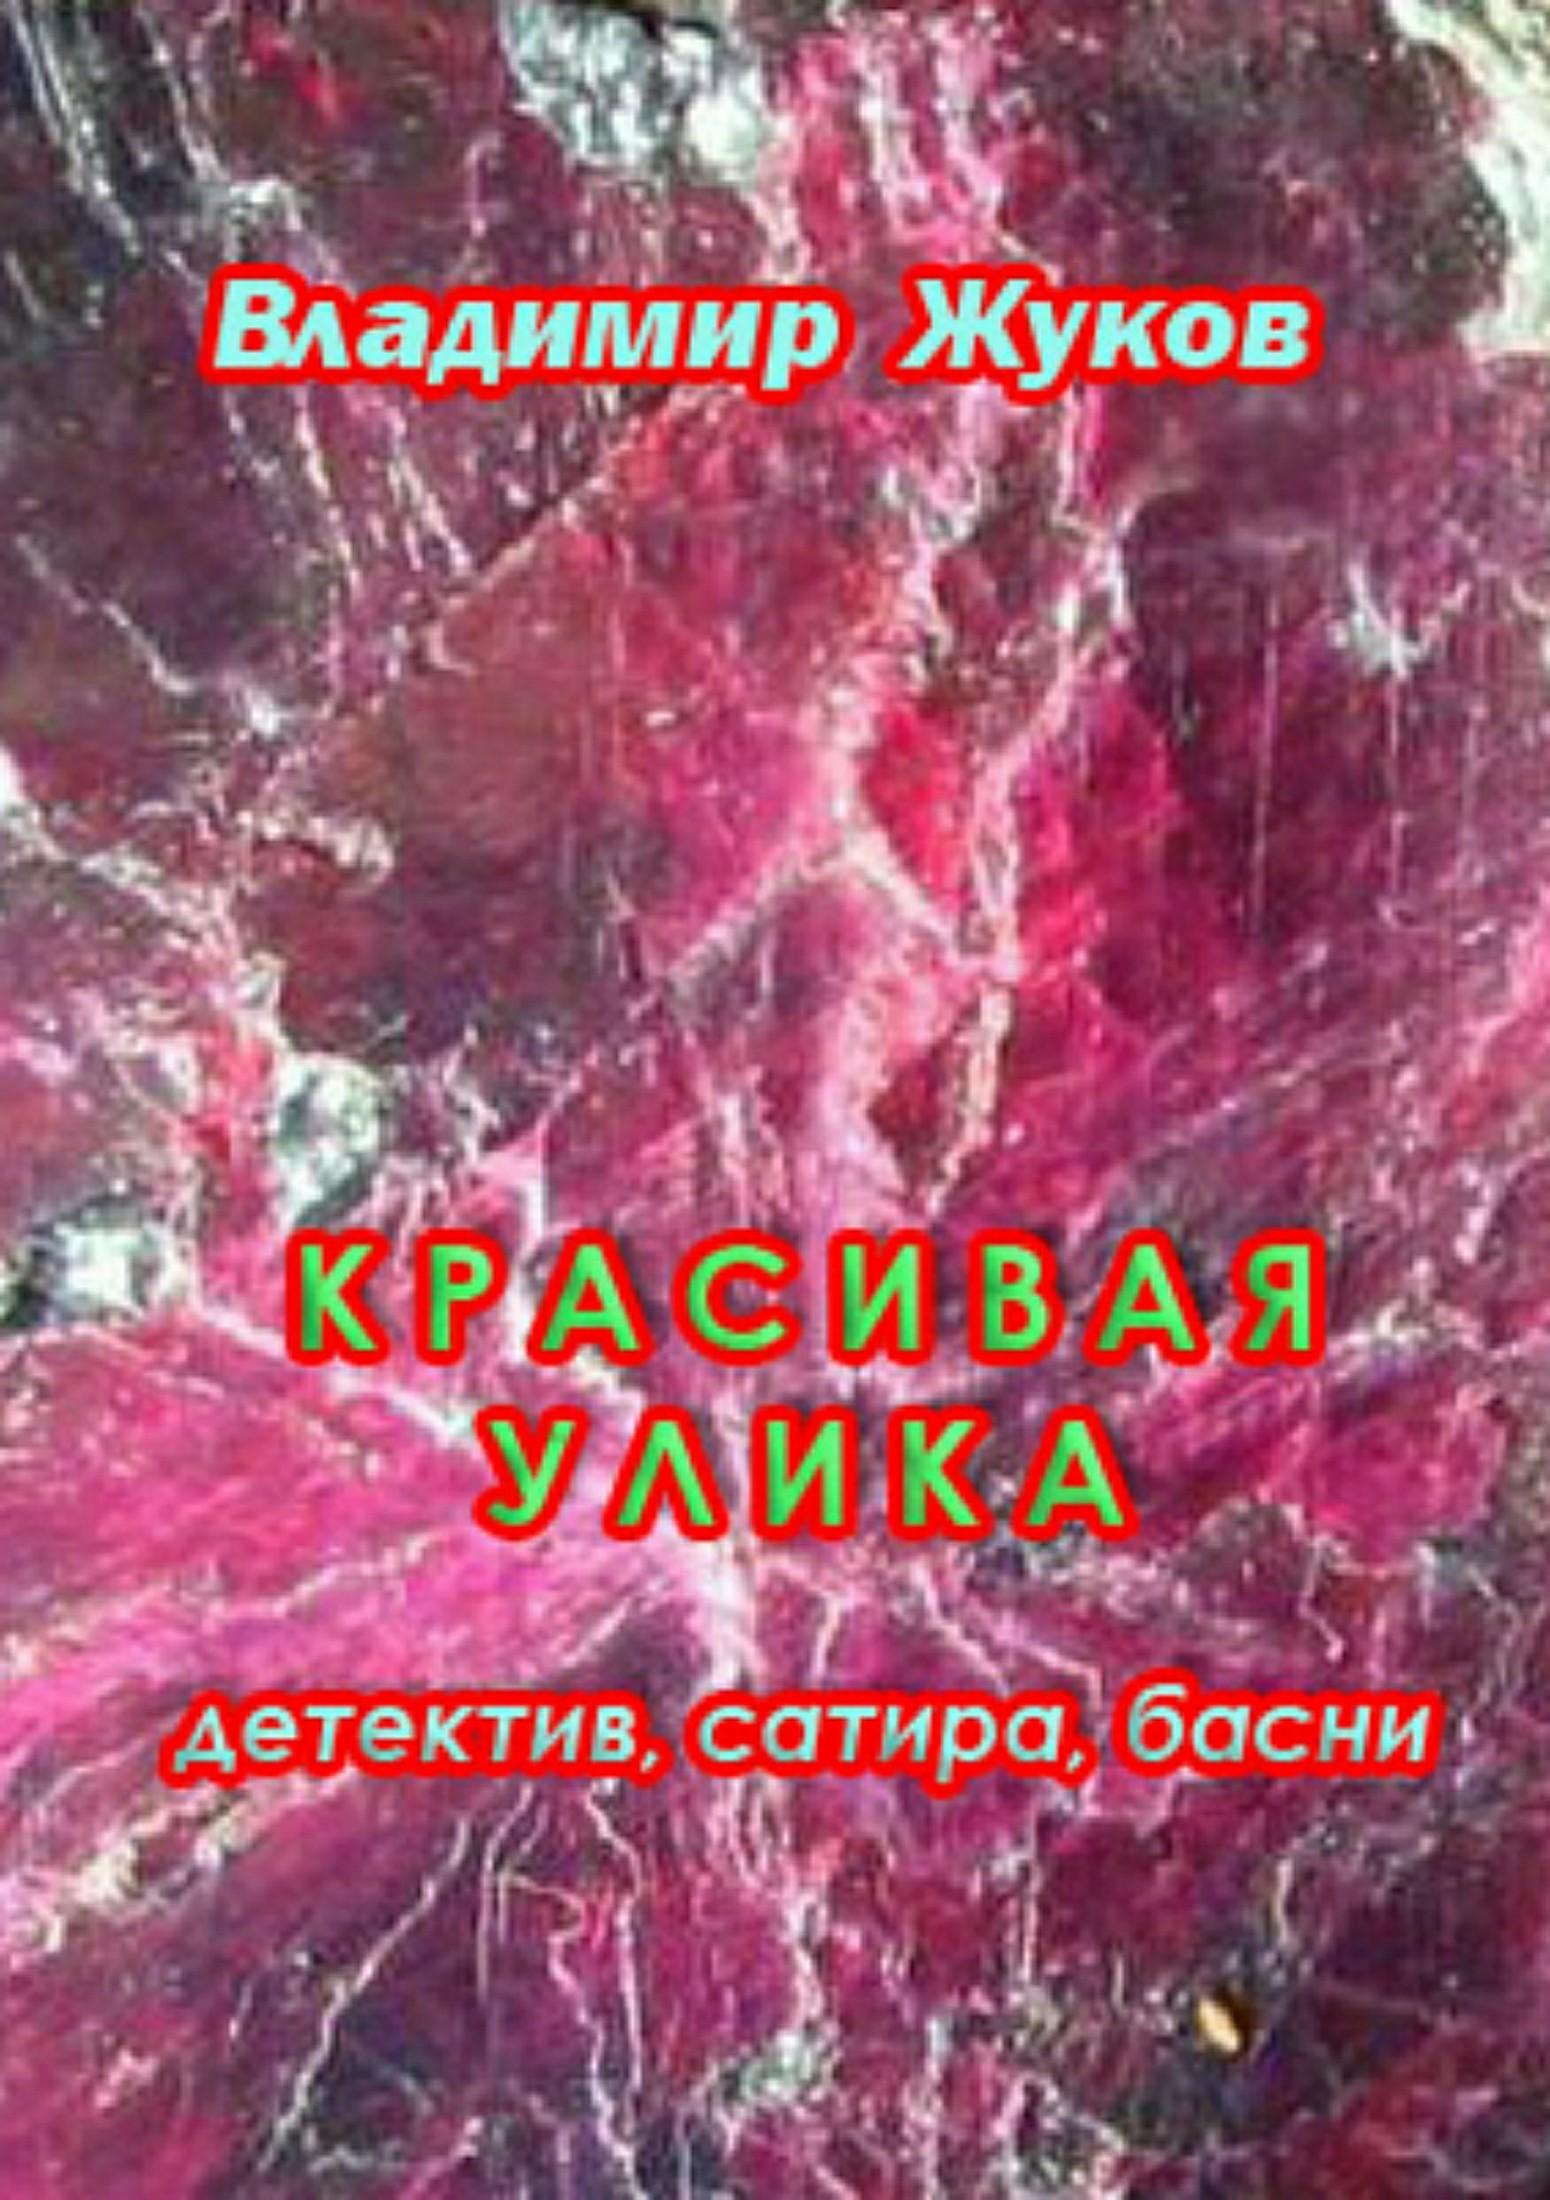 Владимир Александрович Жуков бесплатно